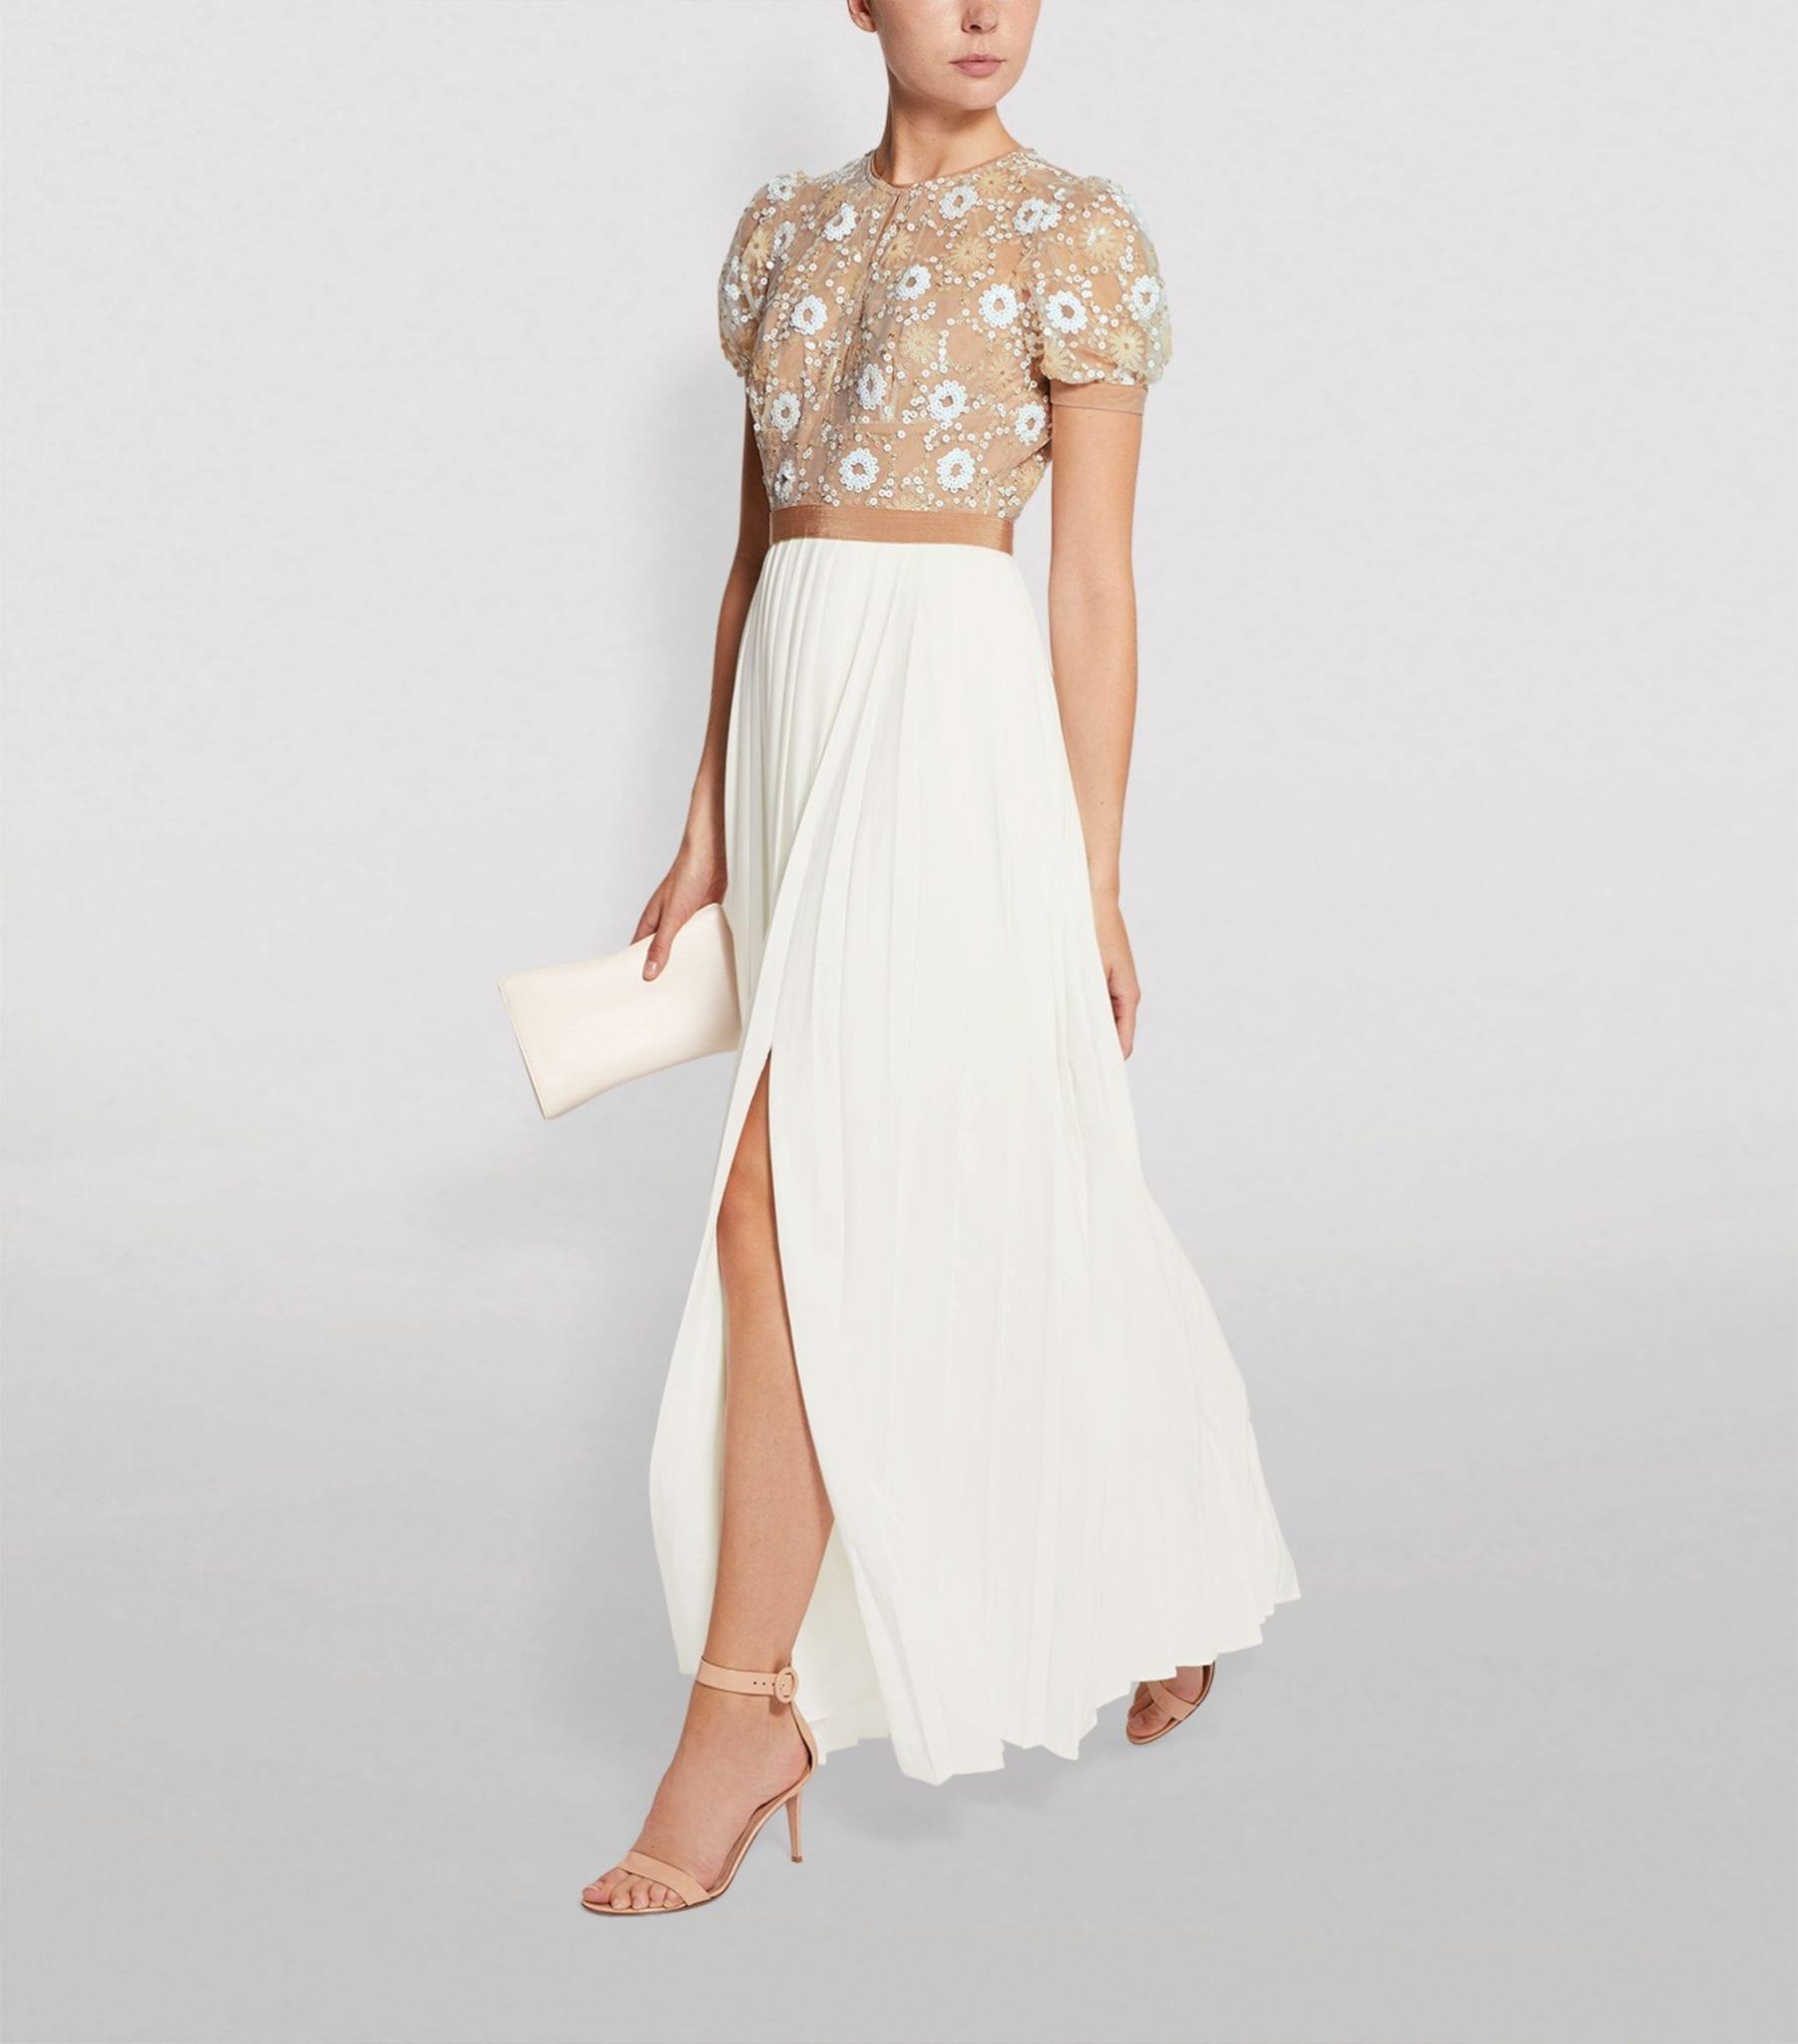 SELF-PORTRAIT Floral Sequin Chiffon Maxi Dress